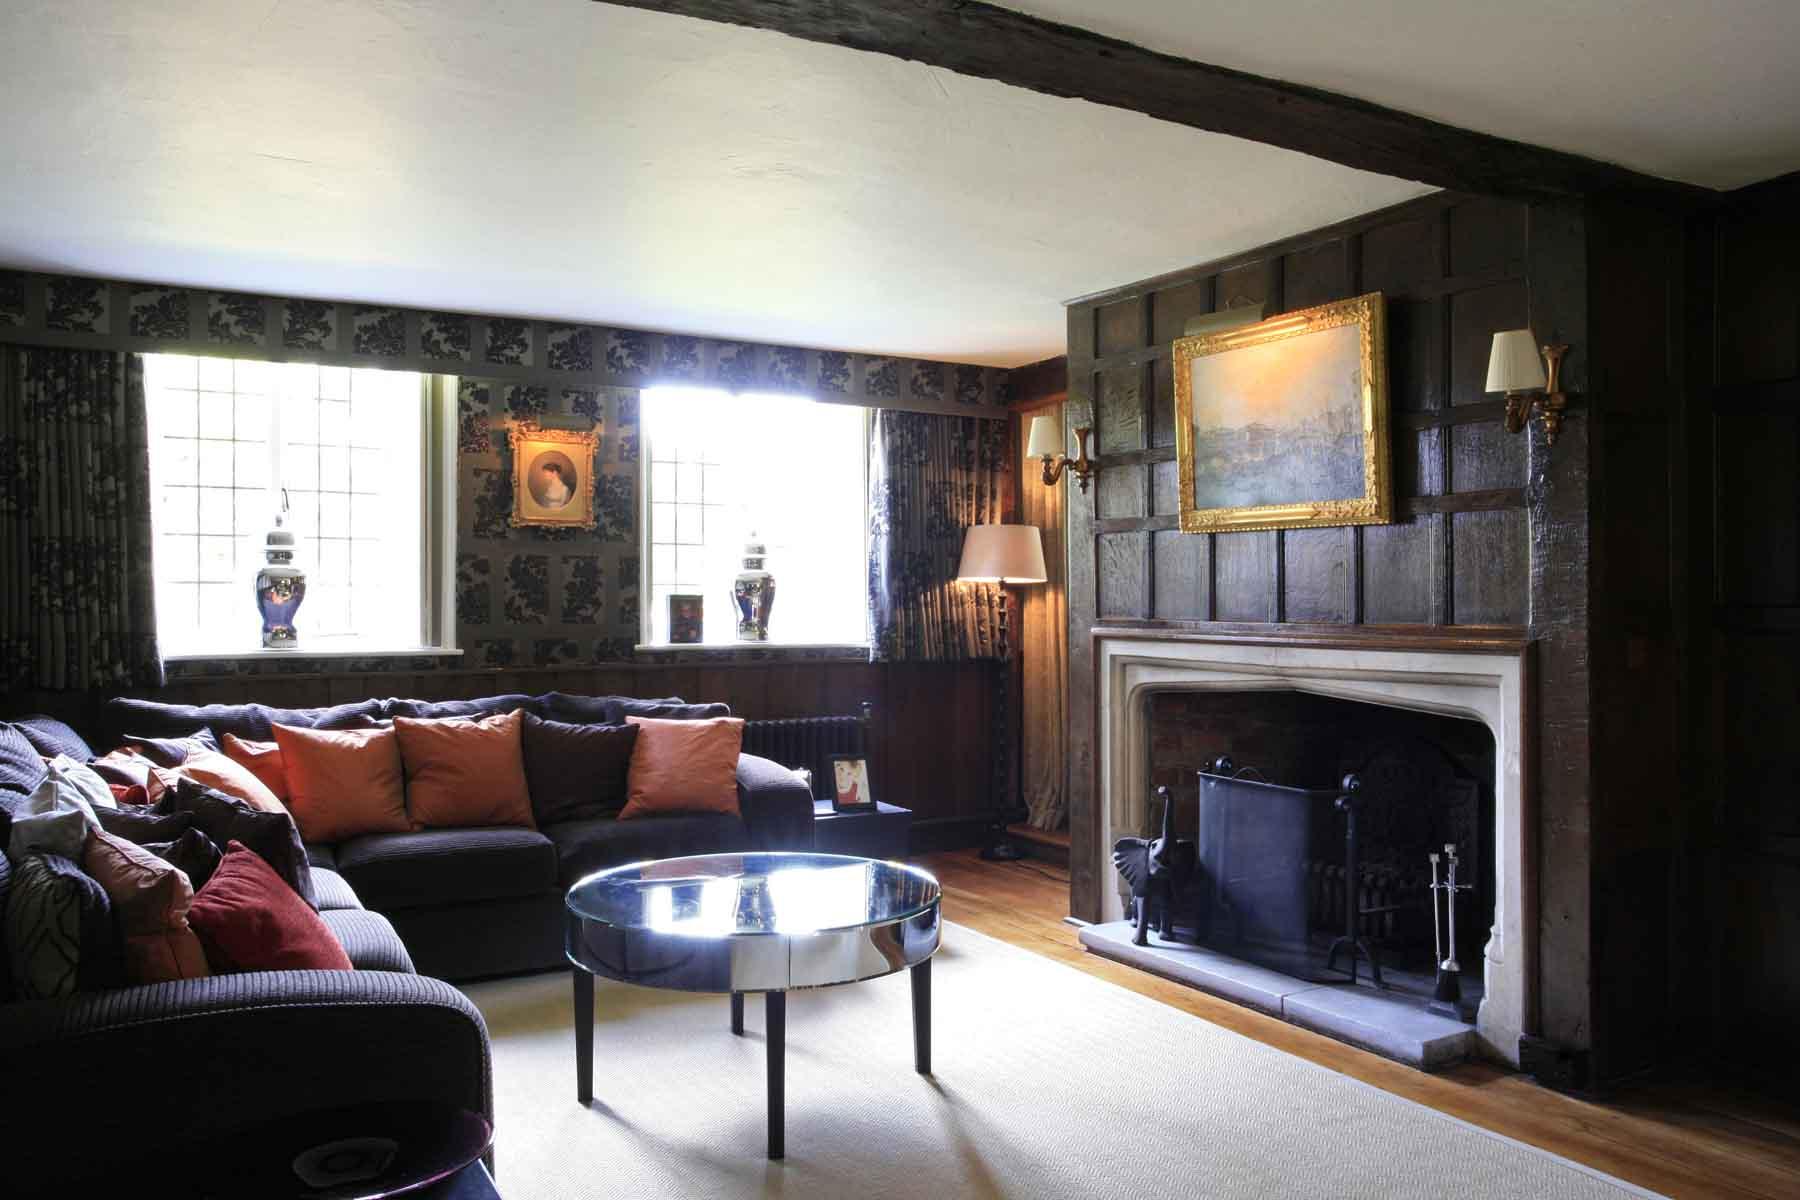 Carol_Fulton_Photography_traditional_interiors__006.jpg